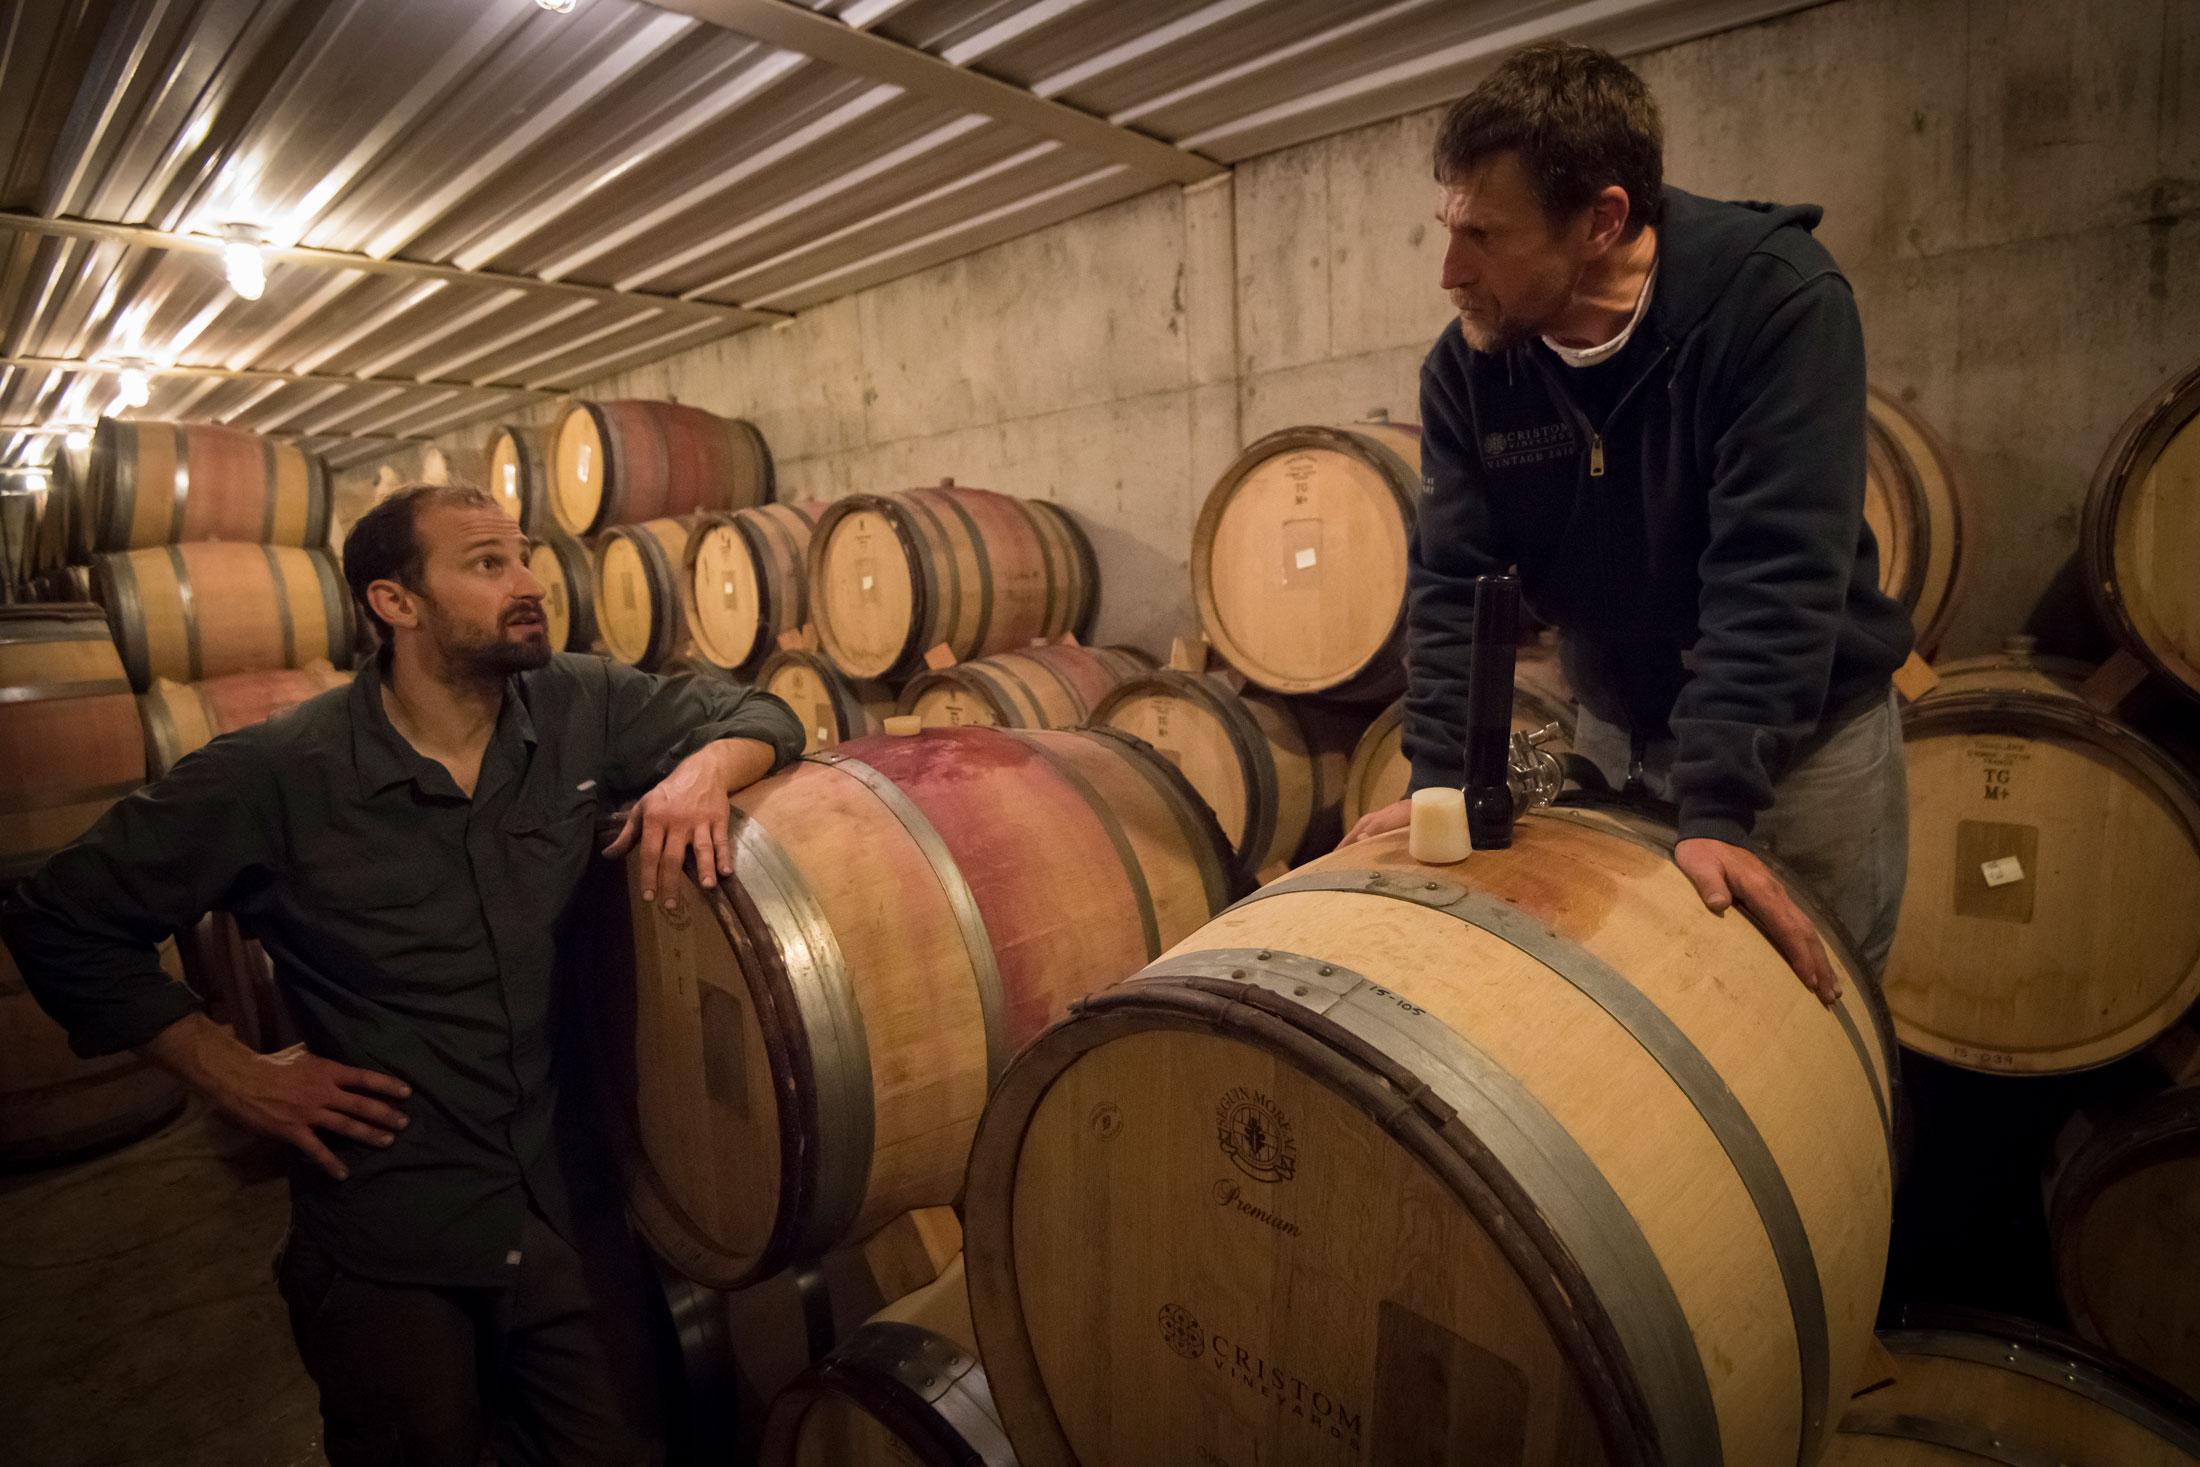 Barreling decision making at Cristom Vineyards